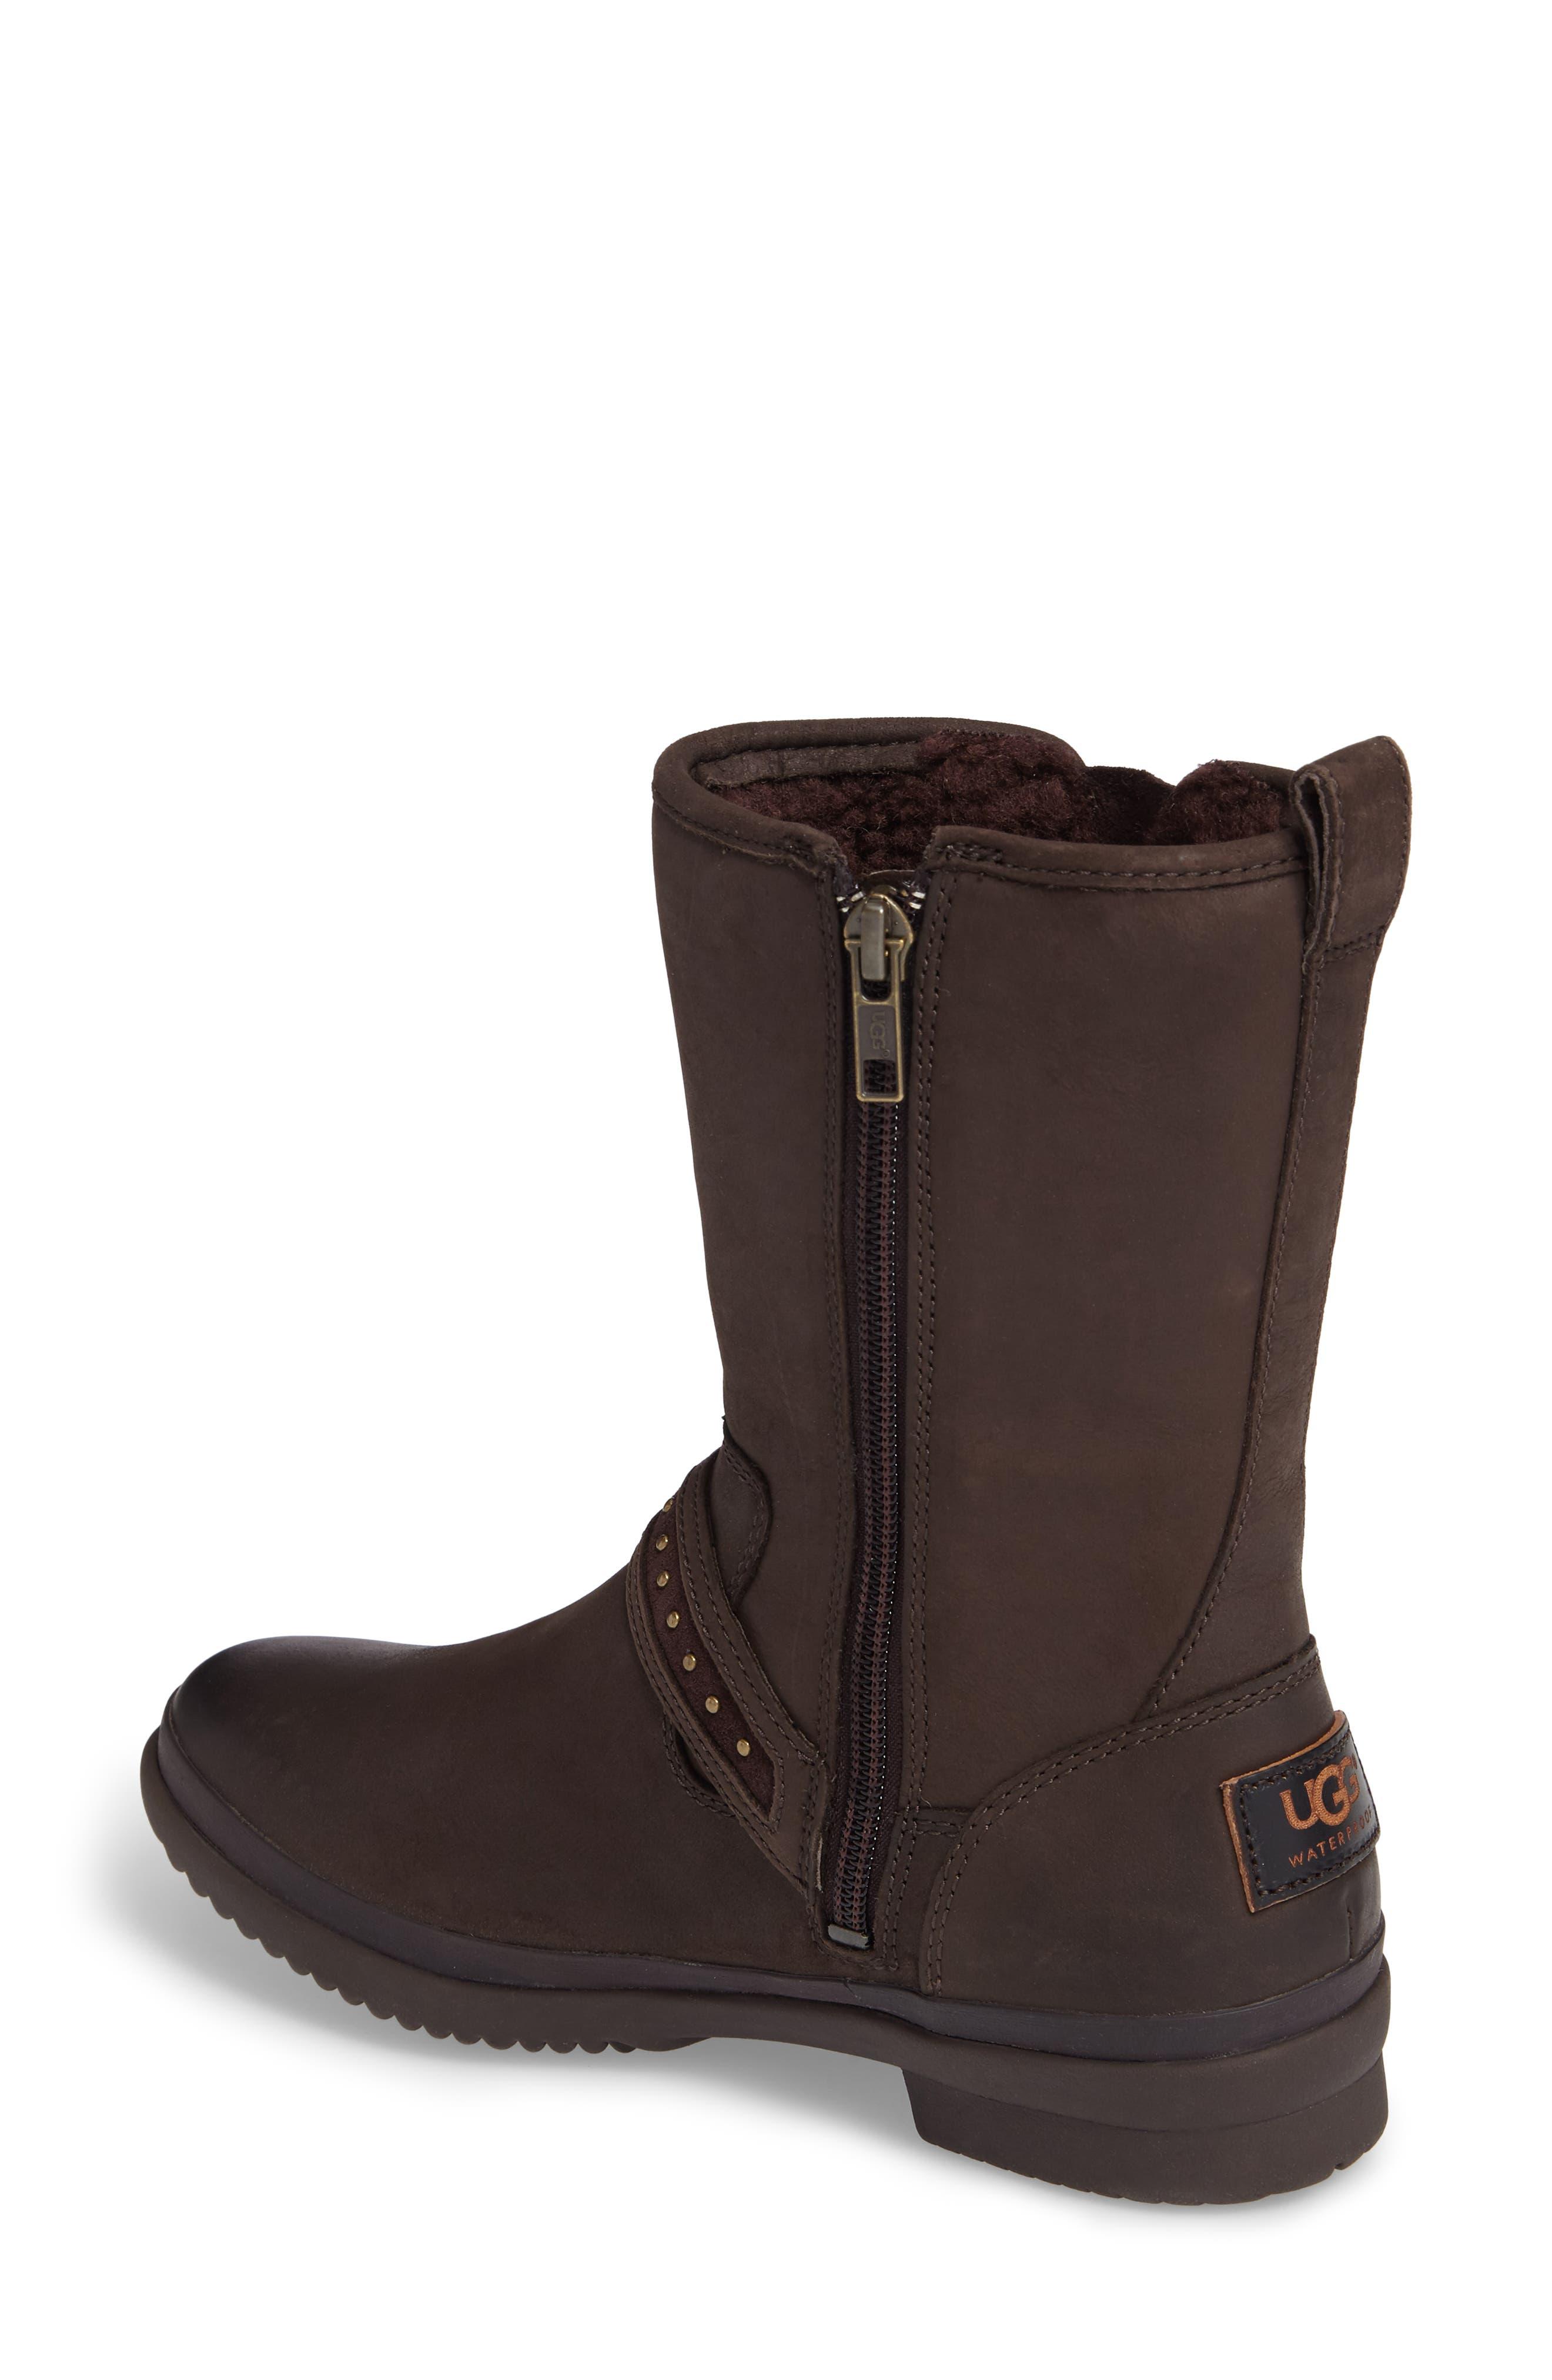 Jenise Waterproof Boot,                             Alternate thumbnail 2, color,                             Stout Leather